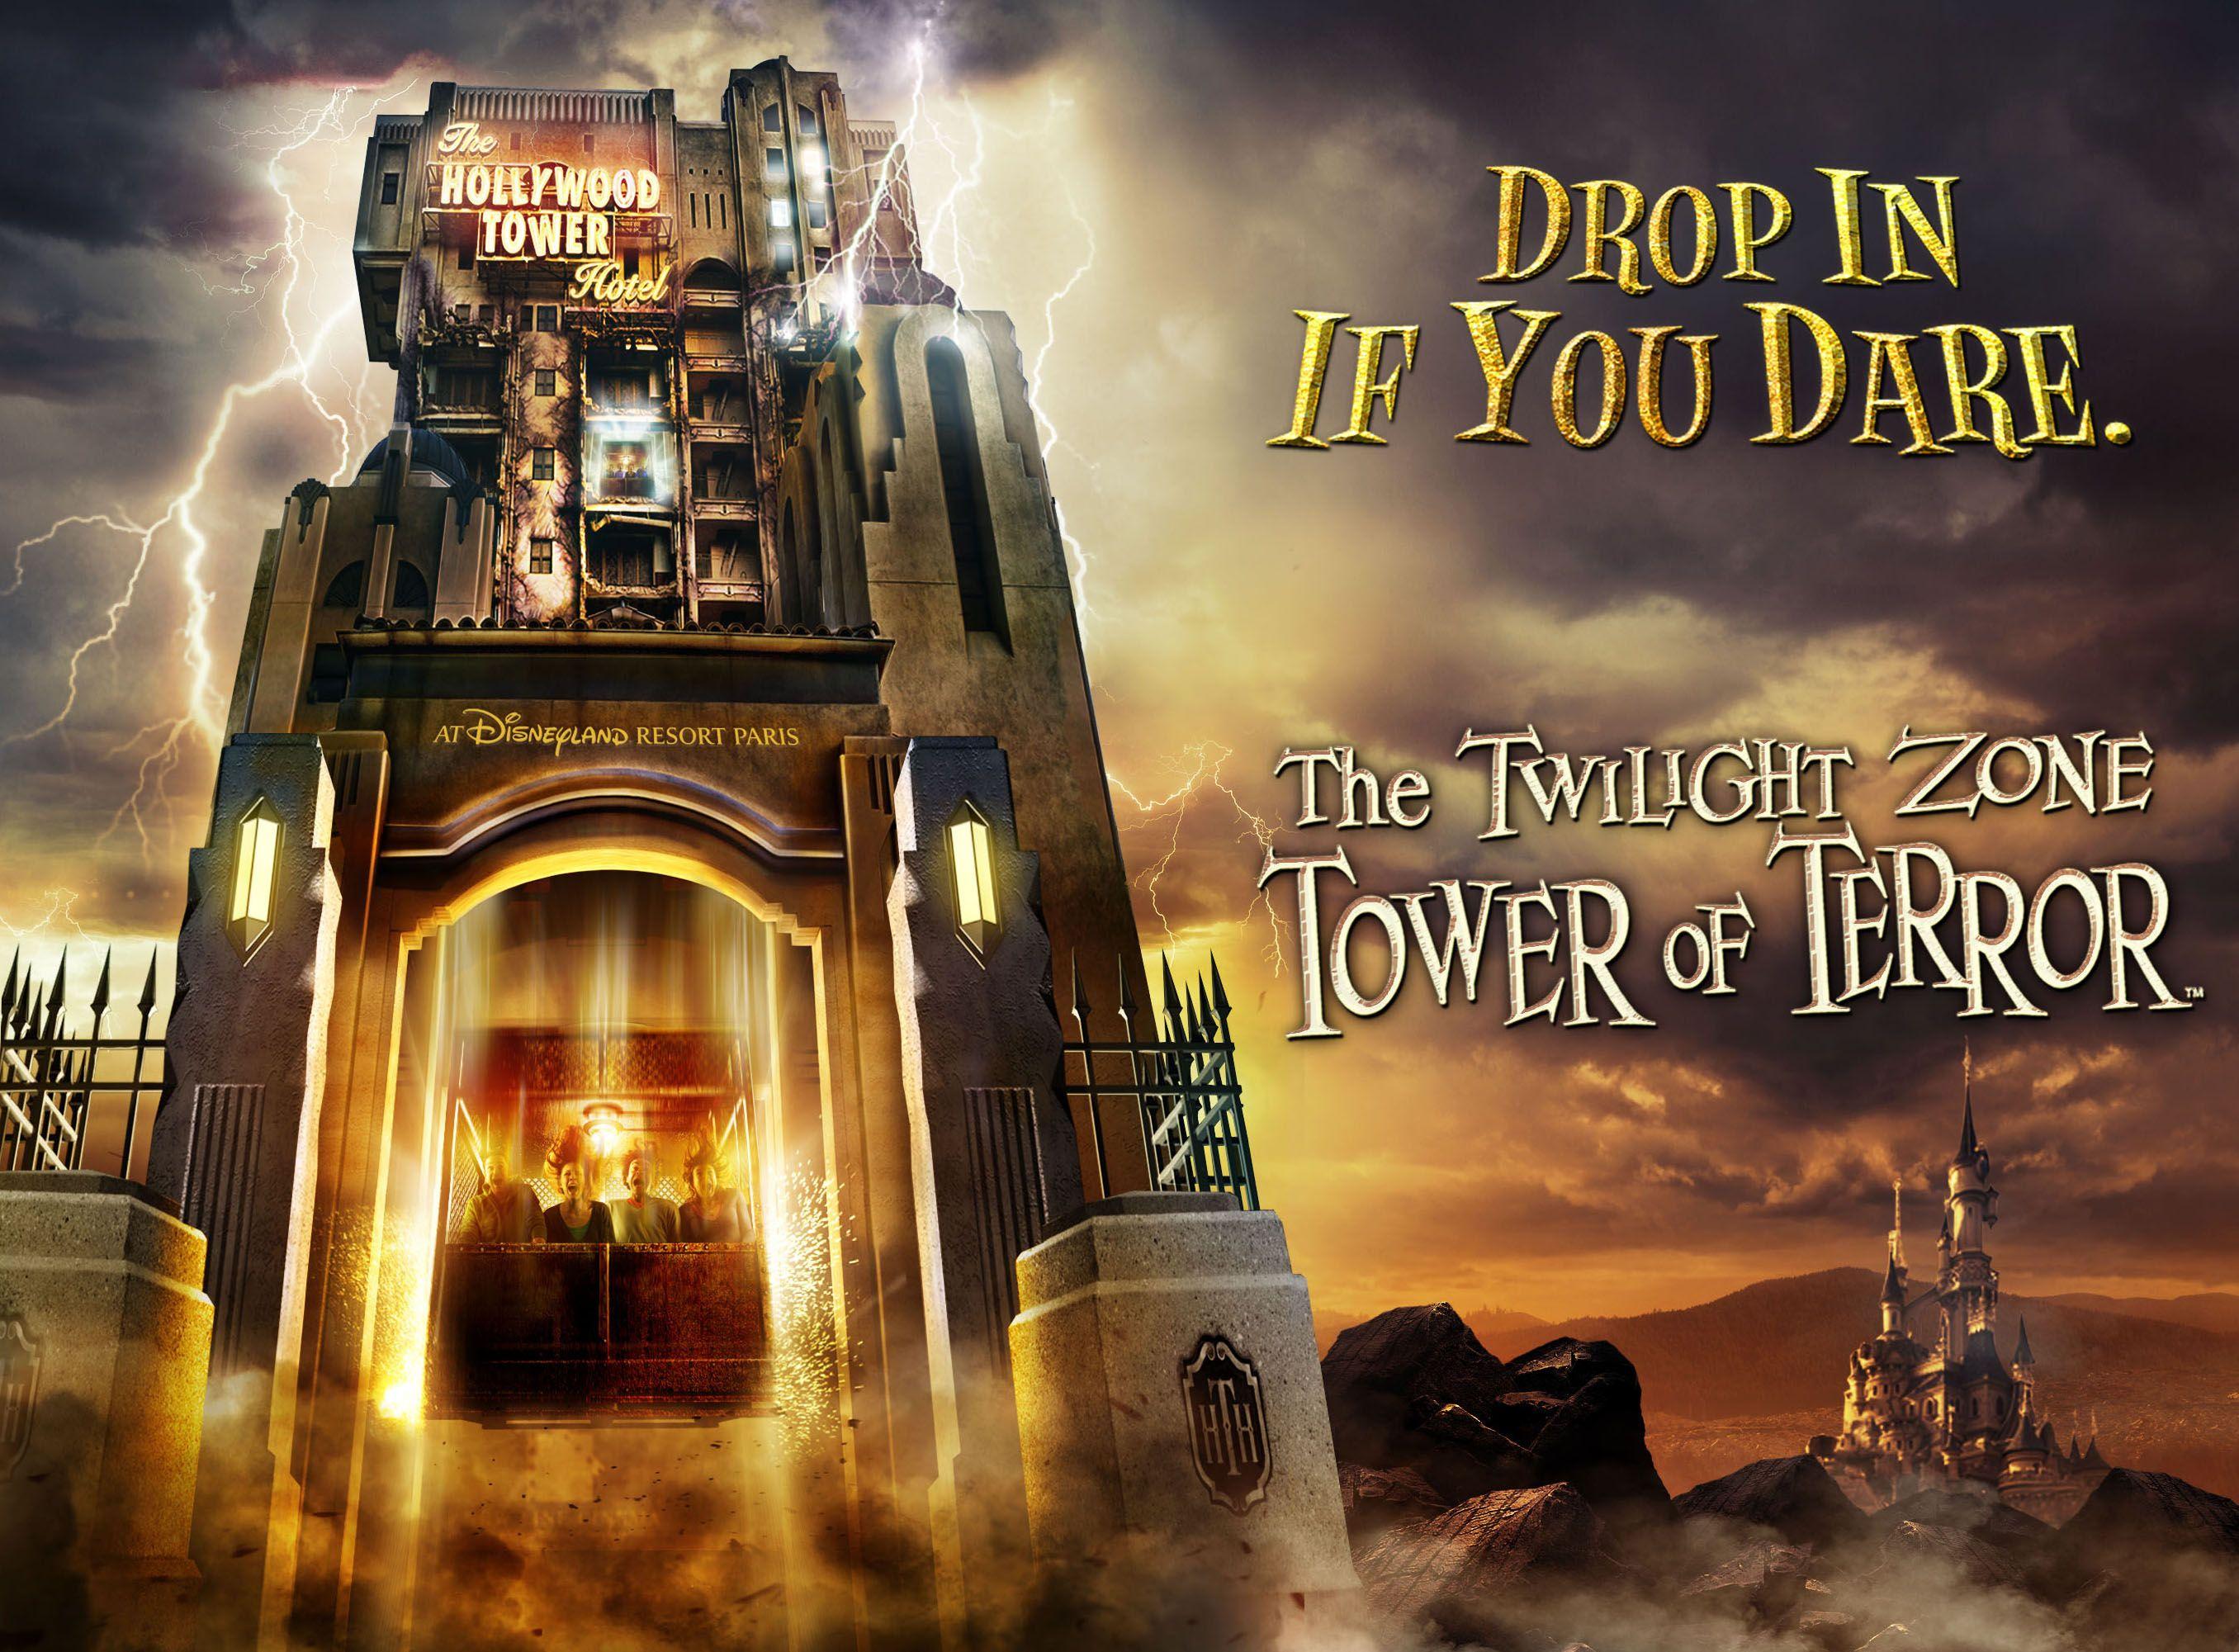 The Twilight Zone Tower Of Terror Tower Of Terror Hollywood Tower Of Terror Disney California Adventure